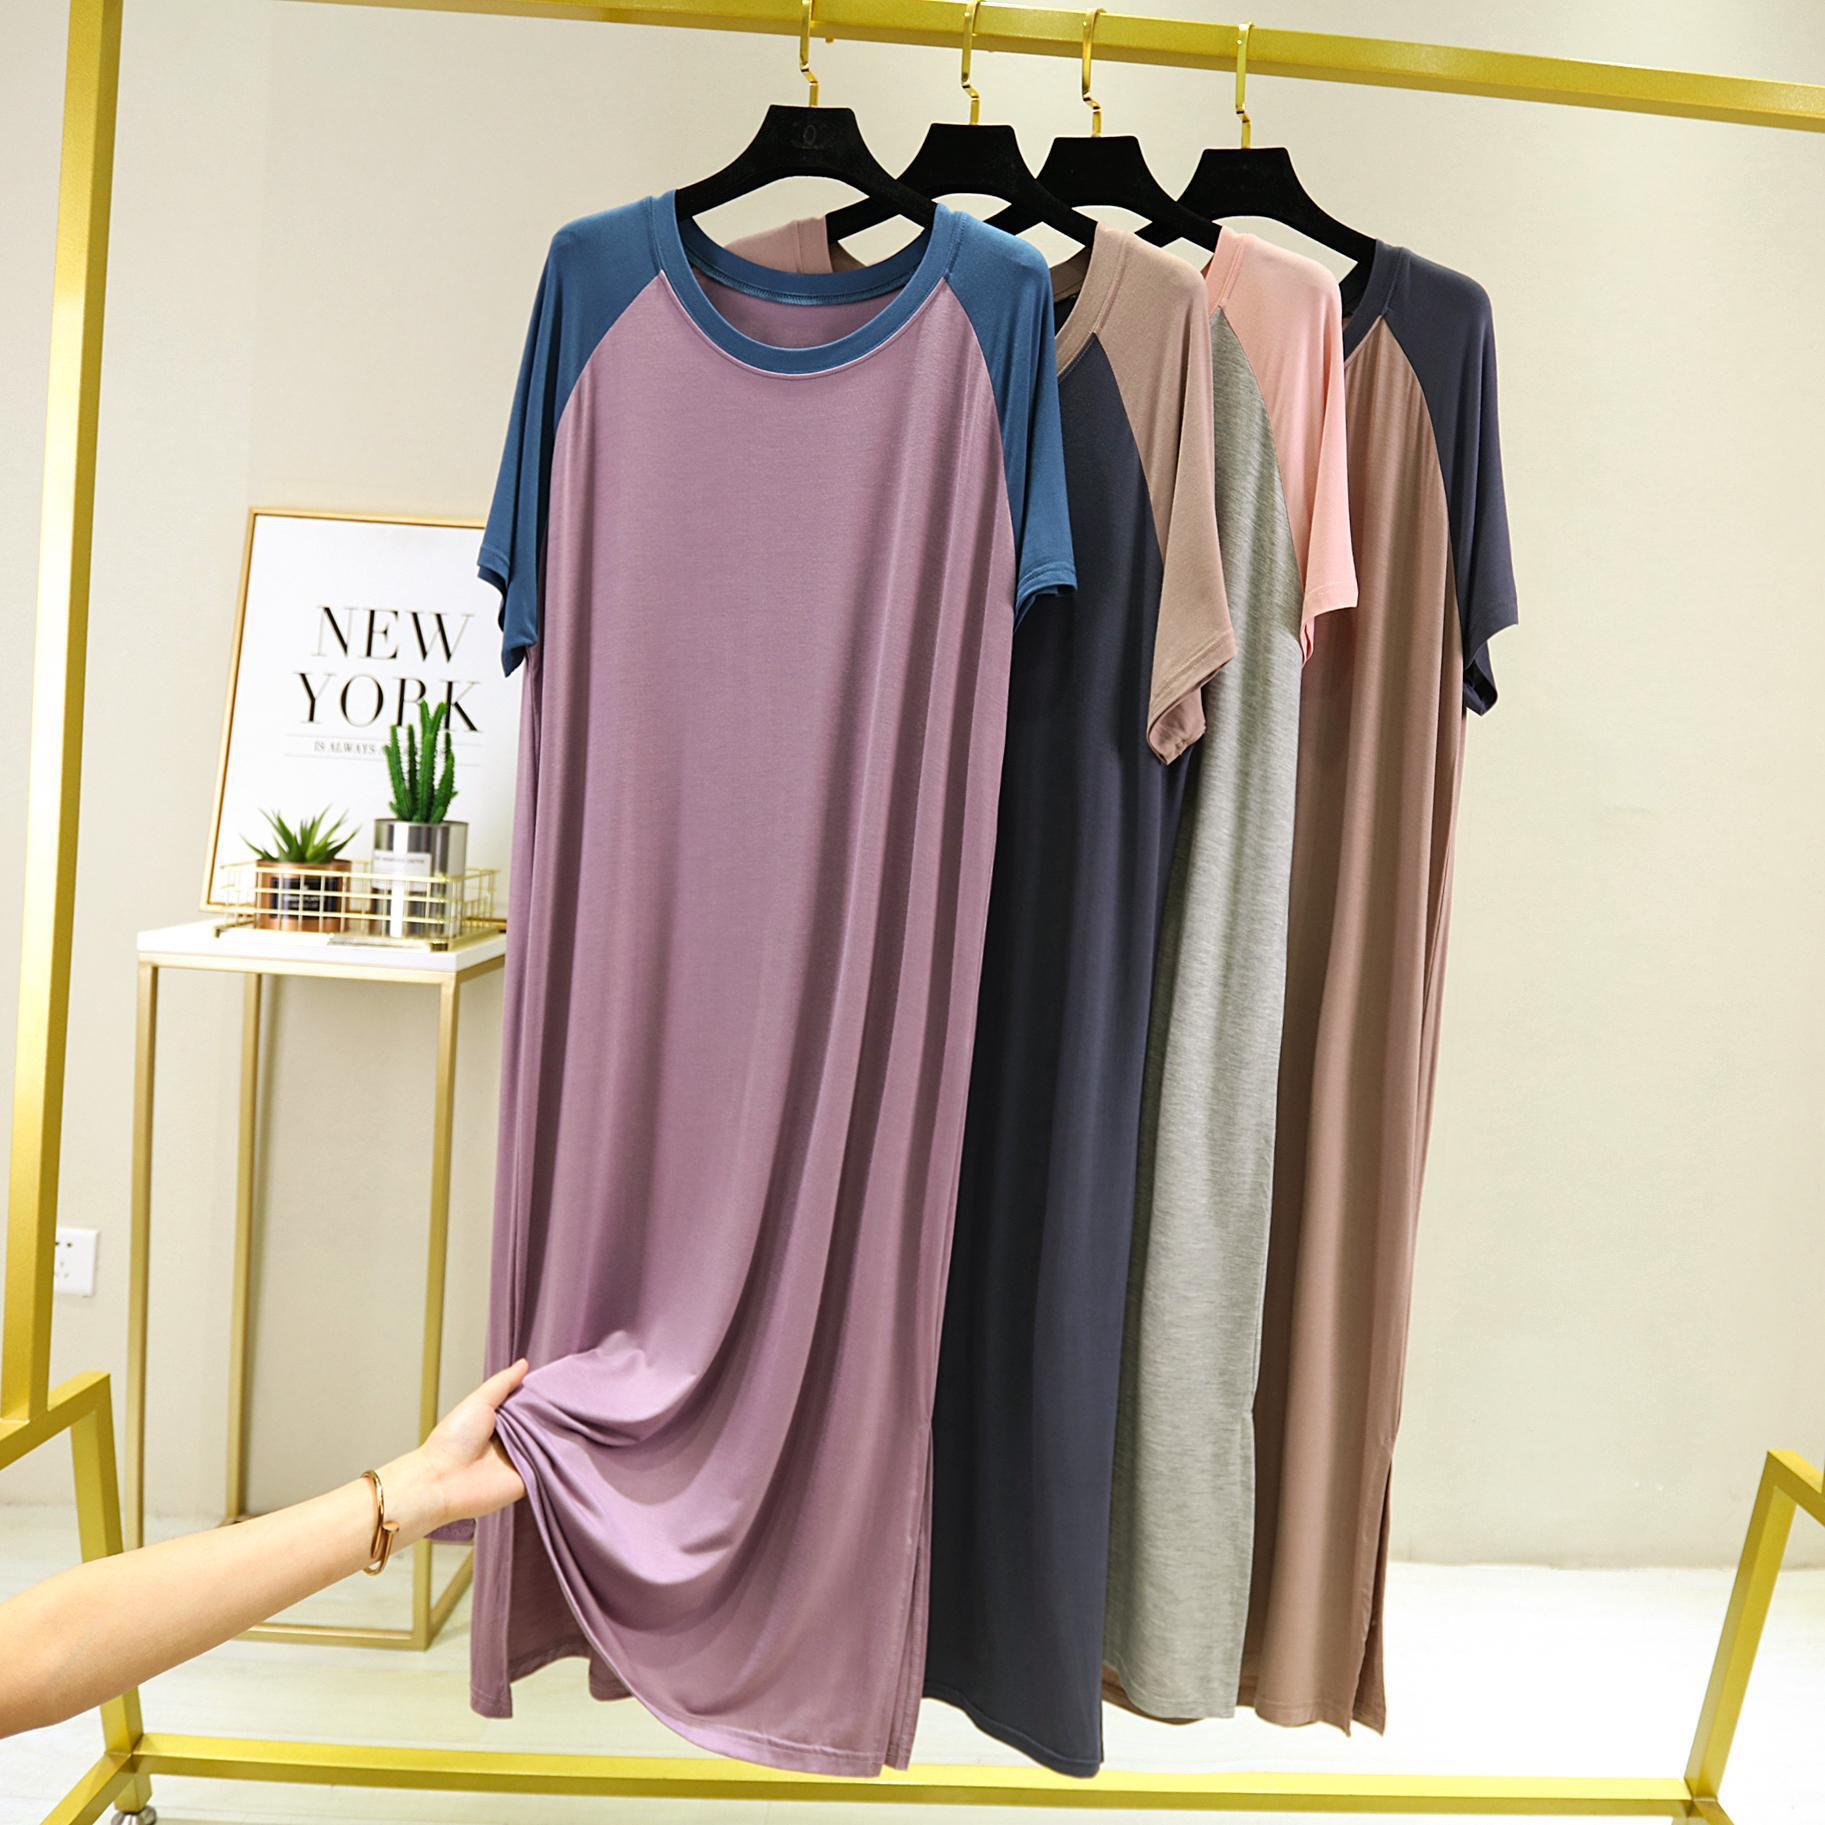 Loungewear longo camisola de verão das mulheres ultra-macio camisola de comprimento total modal sleepwear feminino noite vestido sleepshirts